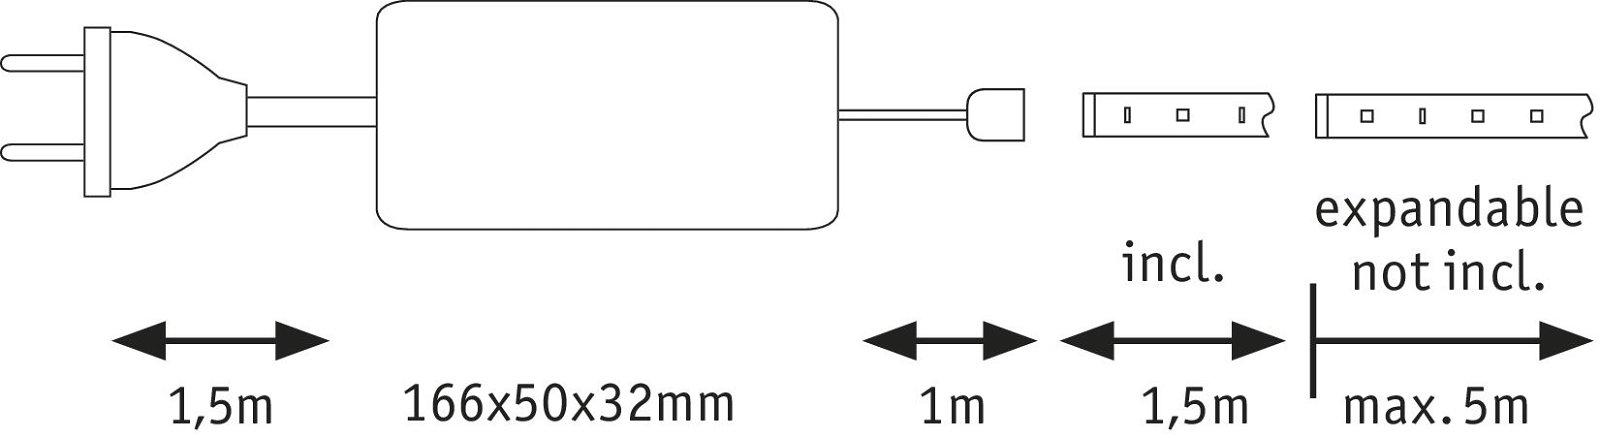 MaxLED 1000 LED Strip Warm wit 1,5m gecoat 18W 1650lm 2700K 36VA